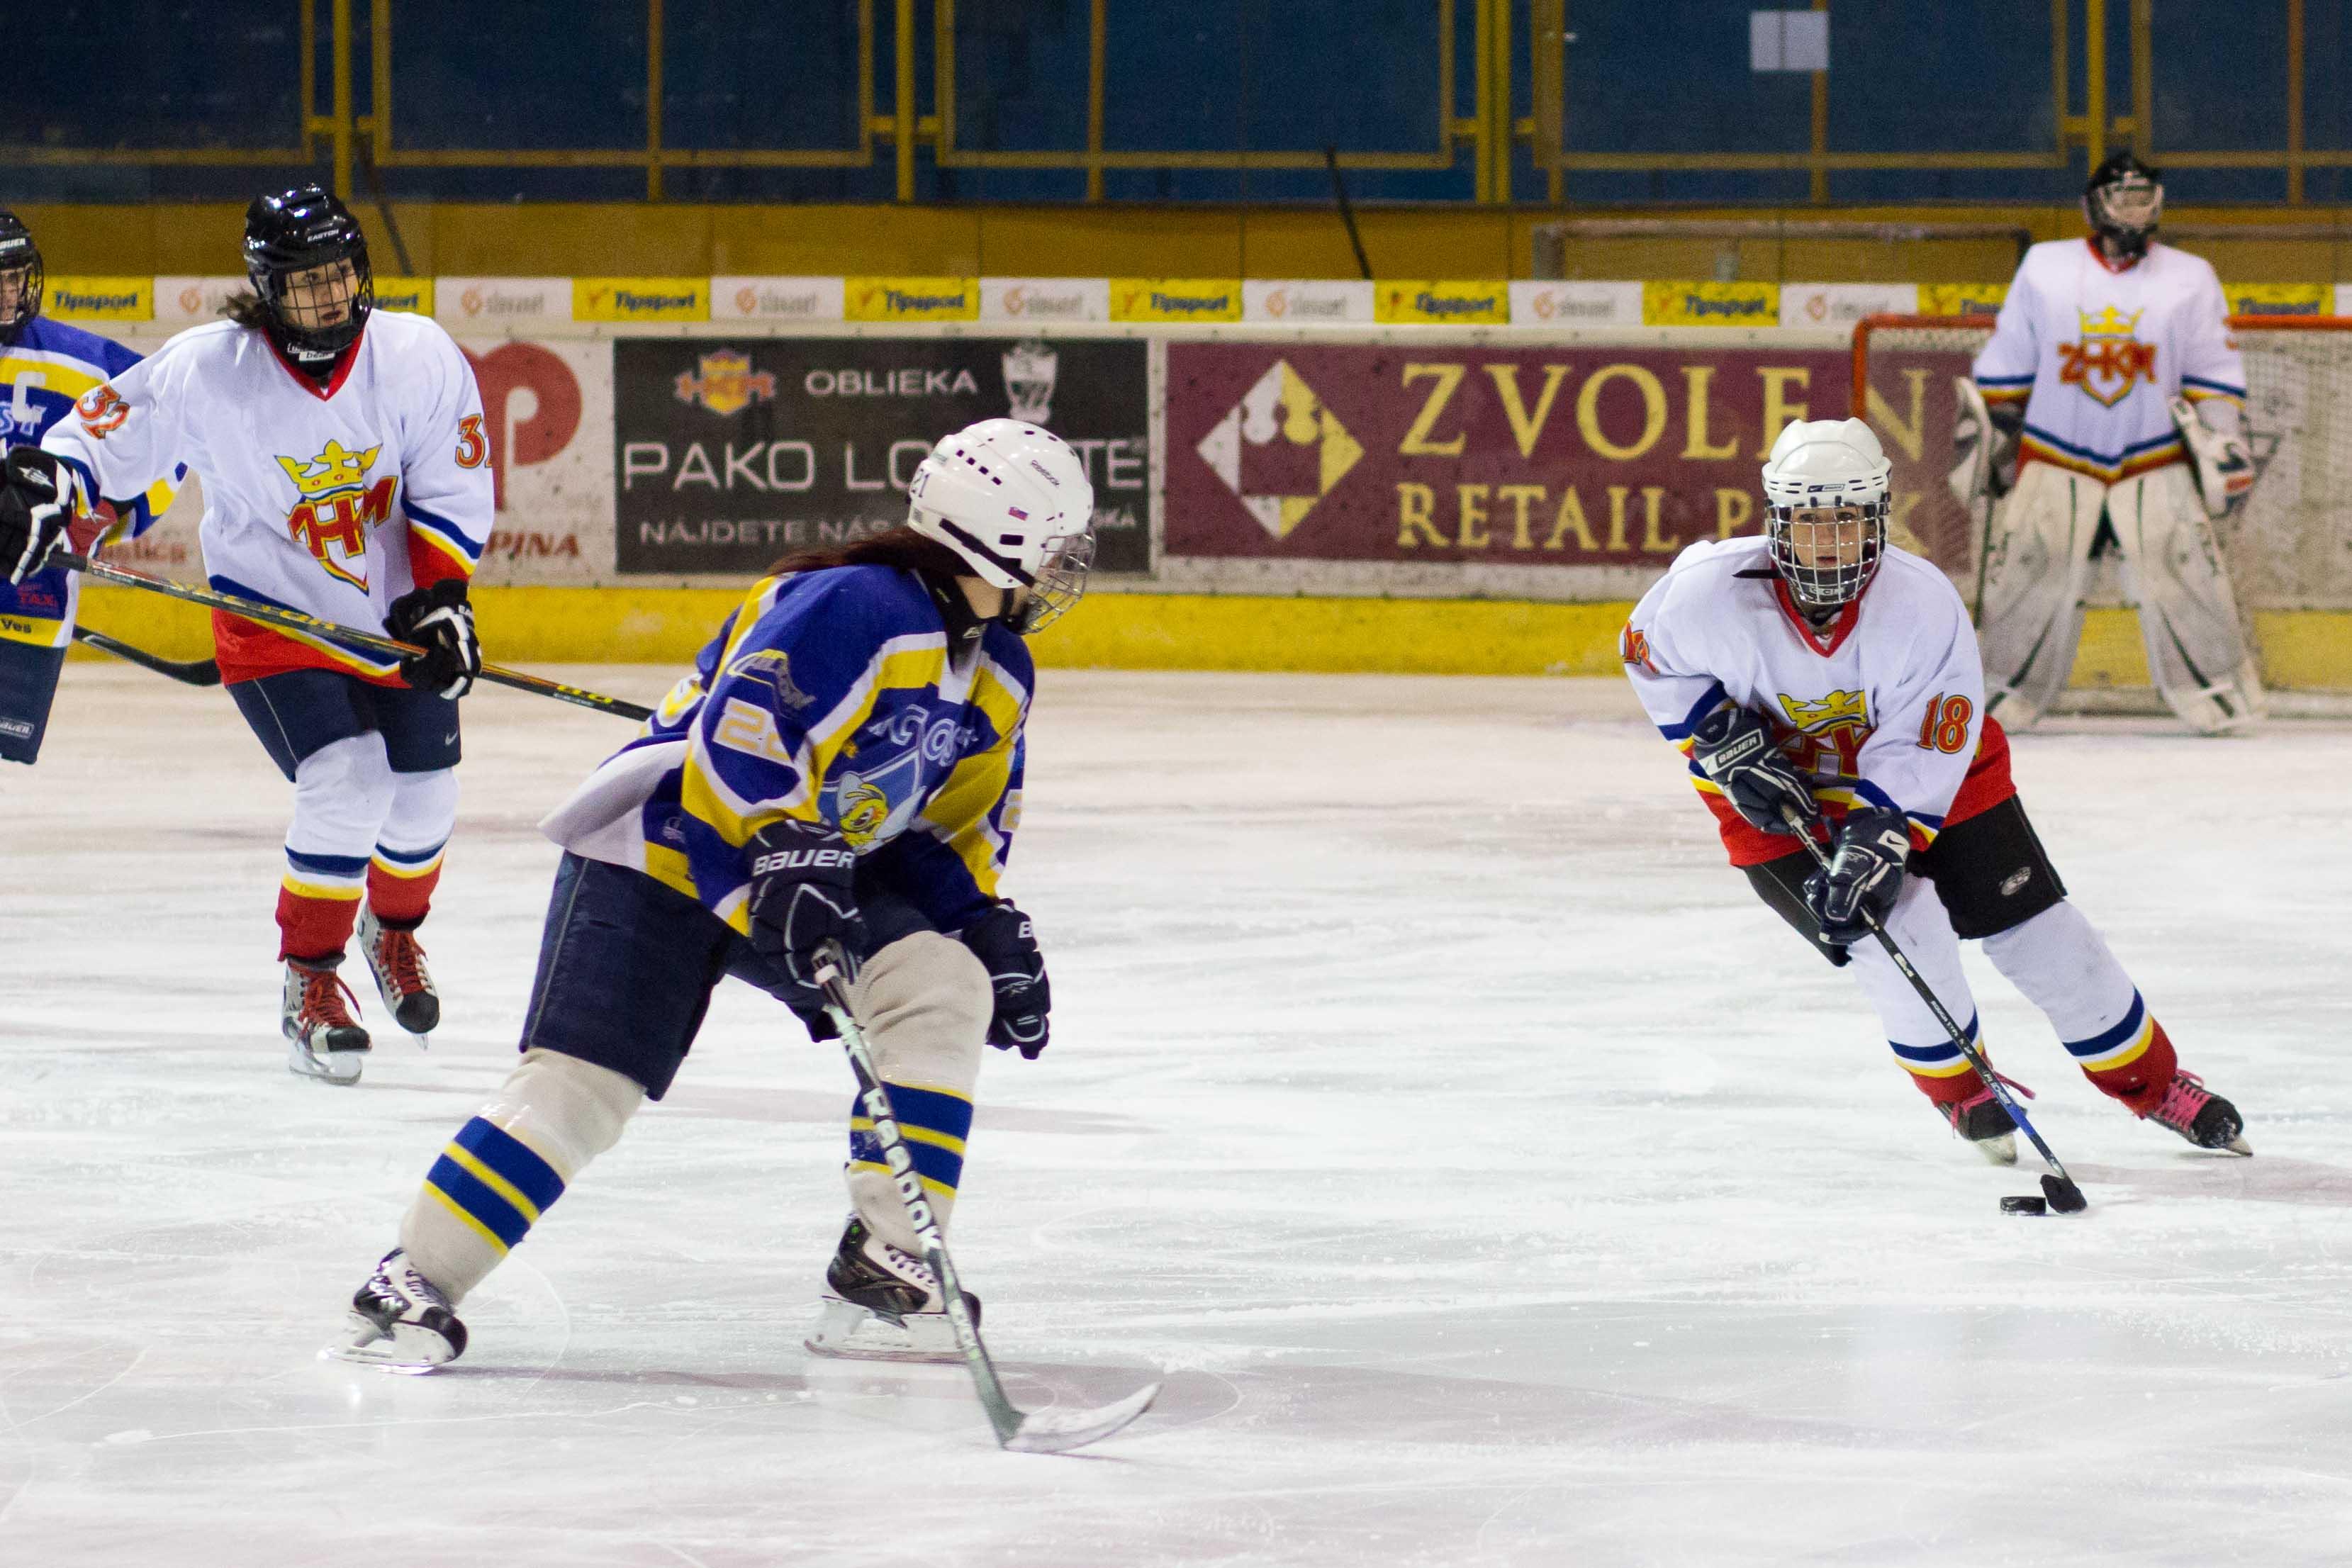 zhkm-zvolen-hc-spisska-n-ves-2013-hokej-5